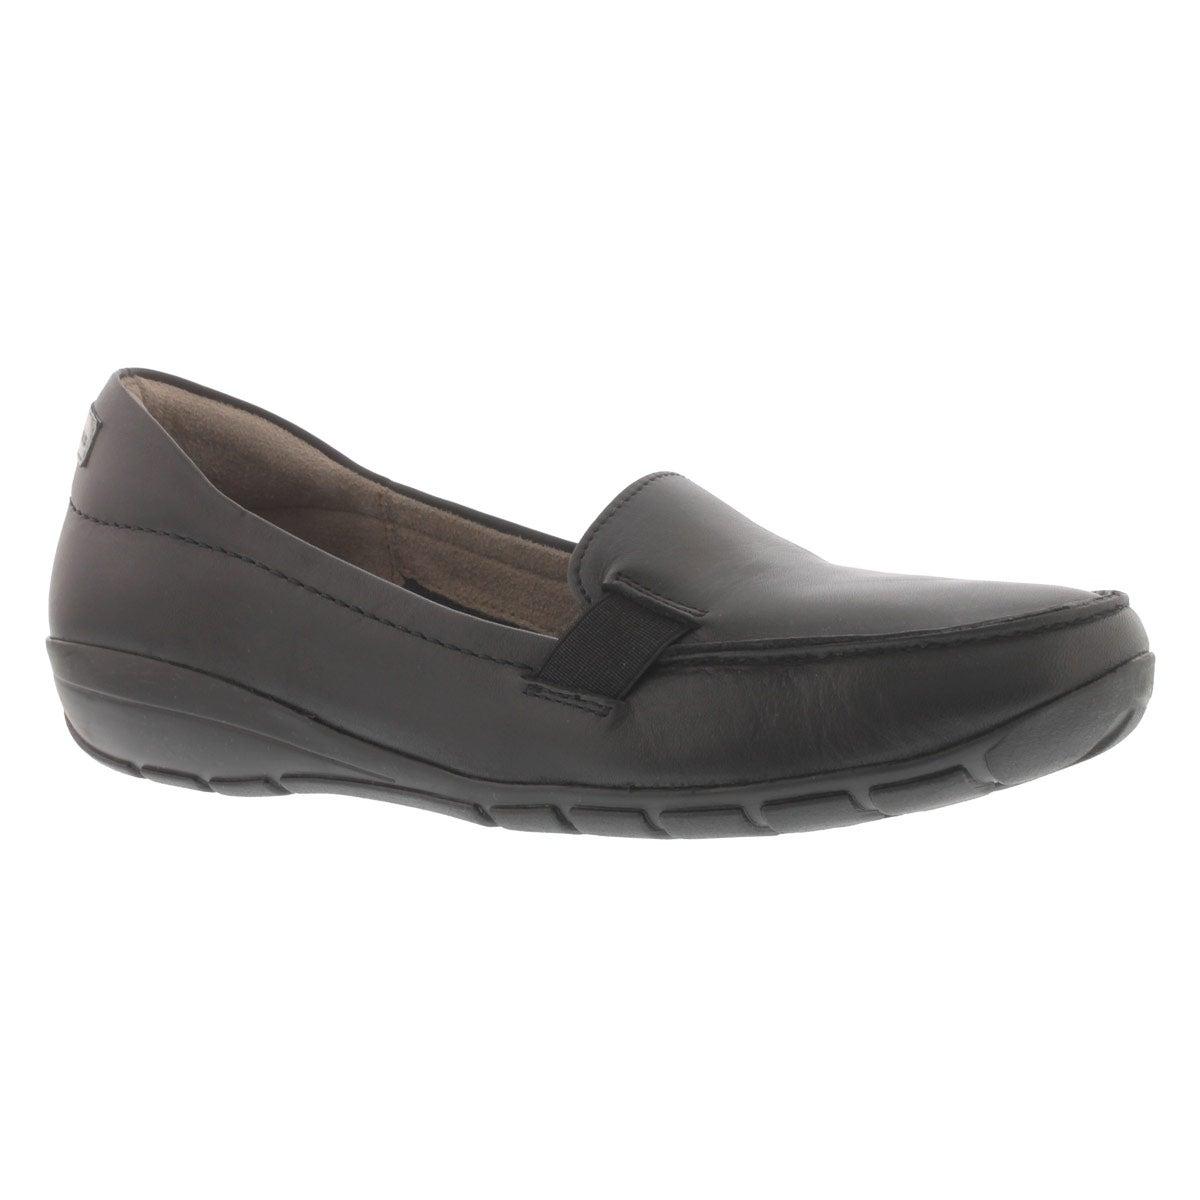 Lds Tilly Dandy blk slip on casual shoe